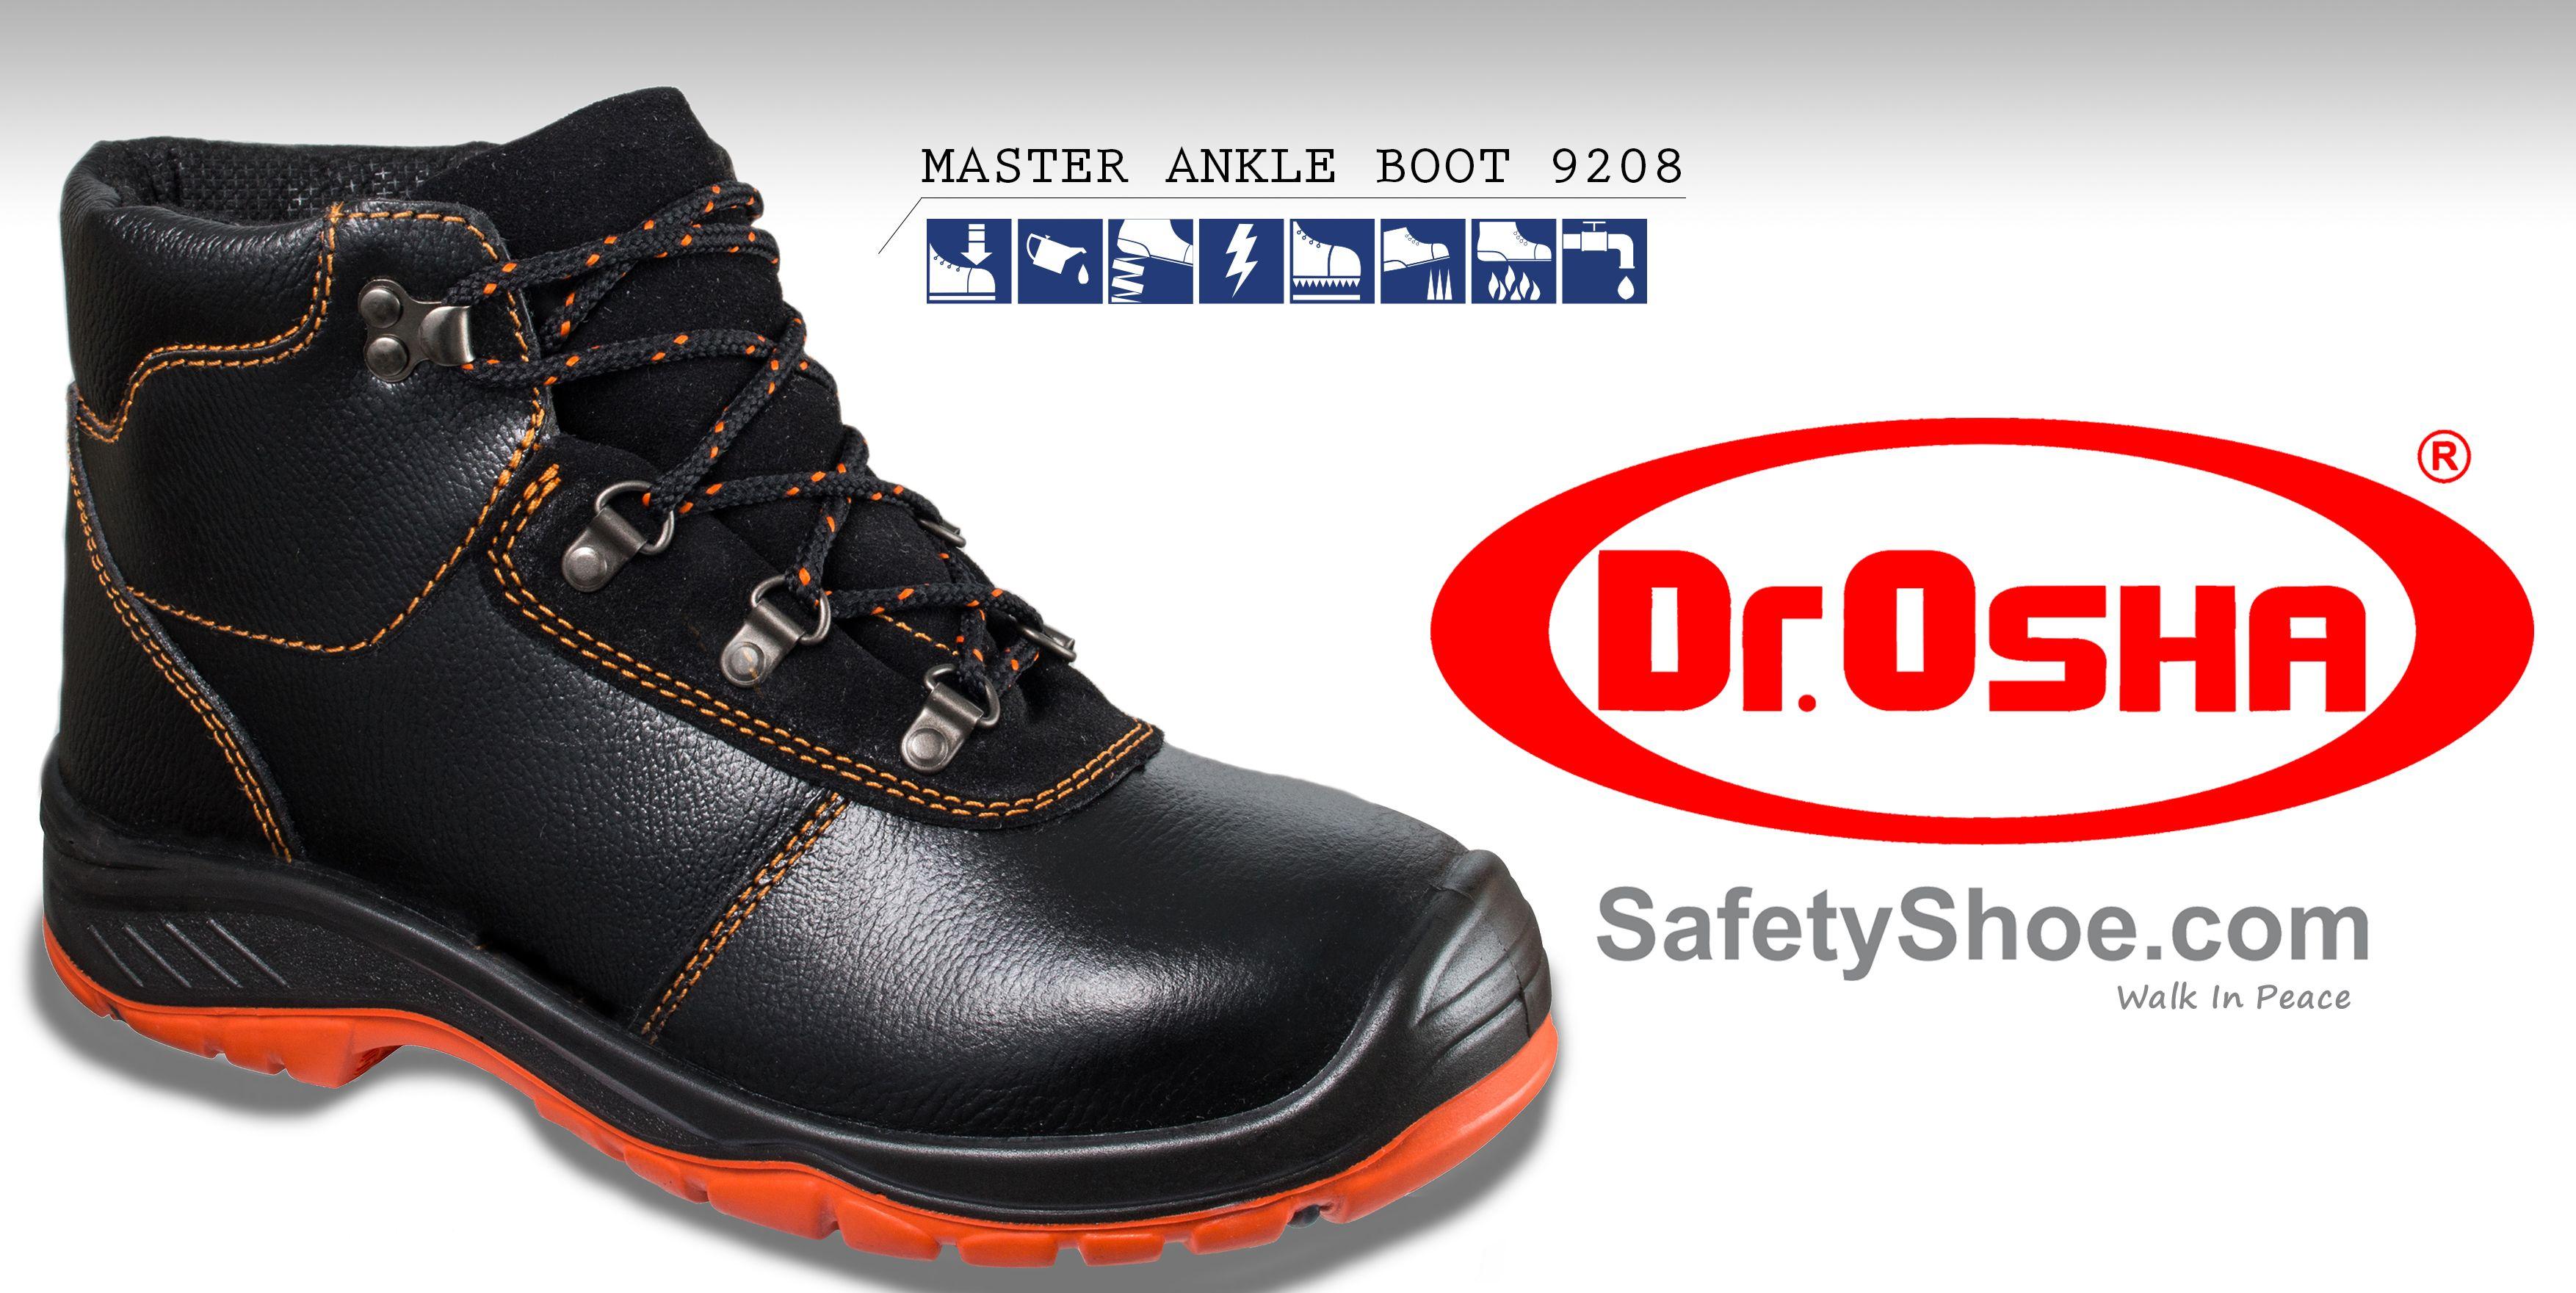 Dr Osha Safety Shoes Hero Straps 3188 Black Update Daftar Harga Cheetah 7106ha Pin By Safetyfootwearco On Sepatu Drosha Commando Ankle Boot